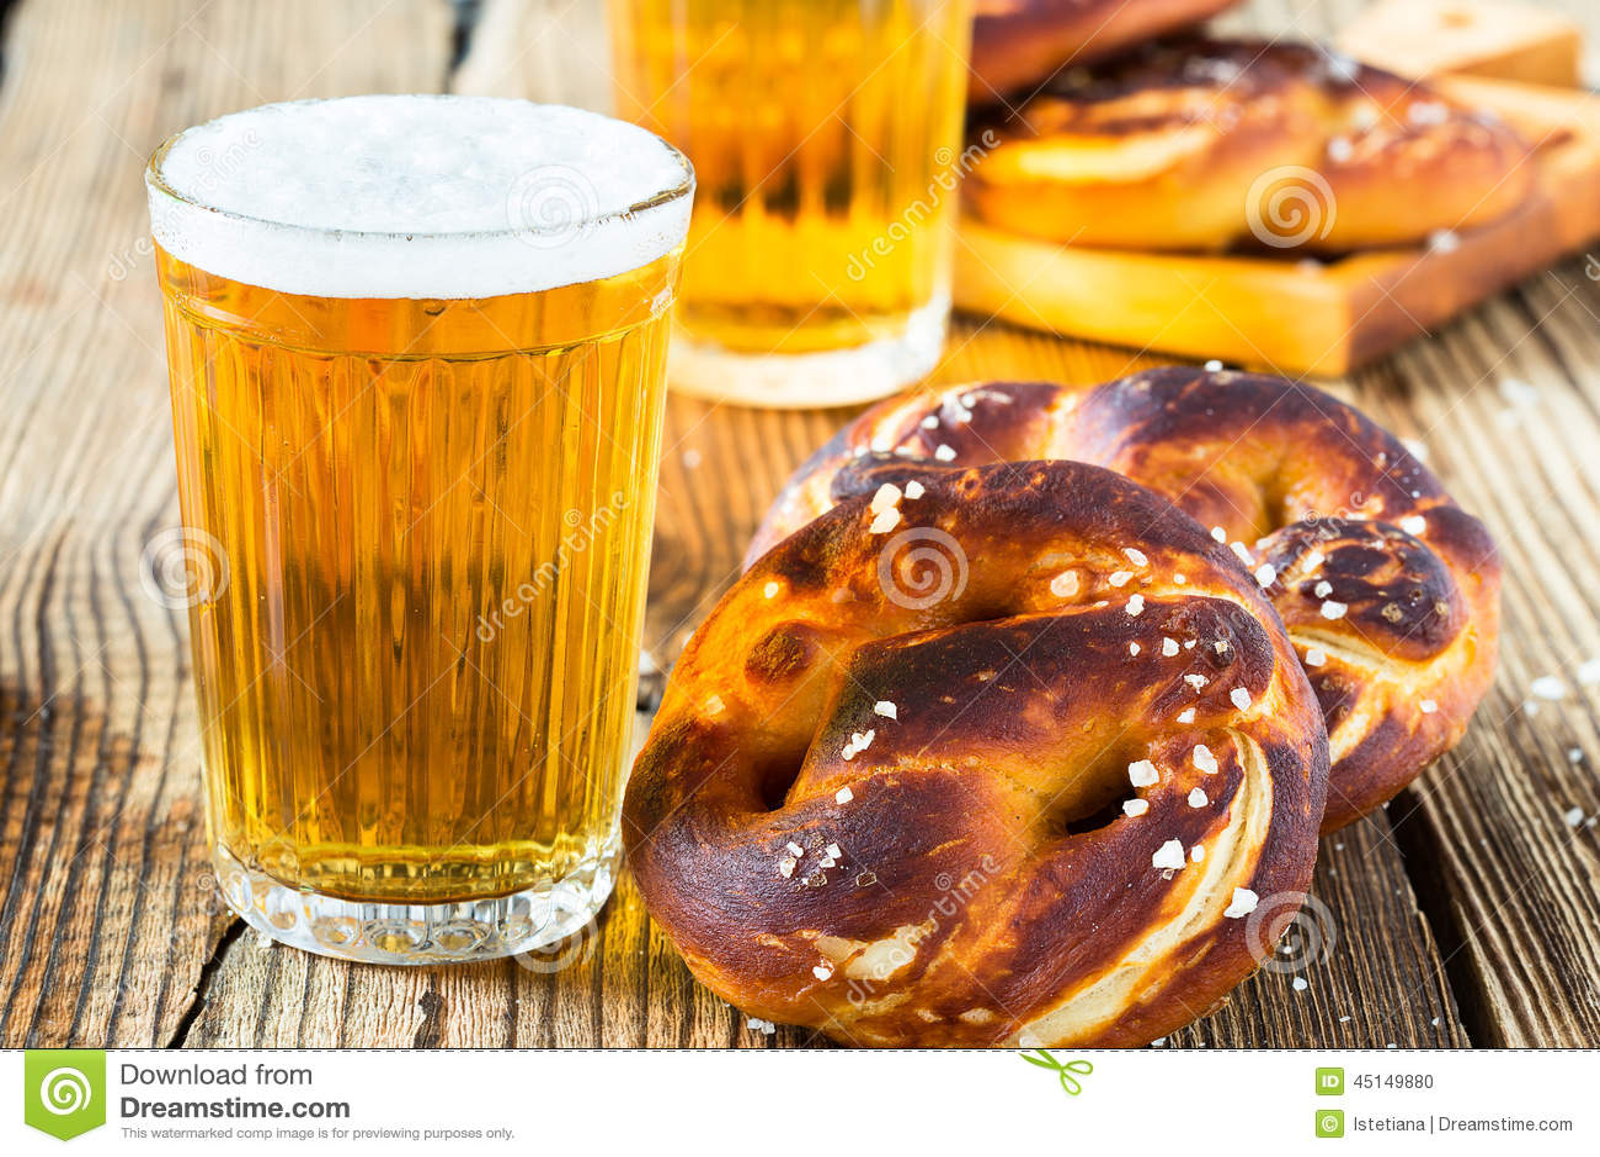 beer drink pretzels bavarian german traditional refreshing fresh ready octoberfest